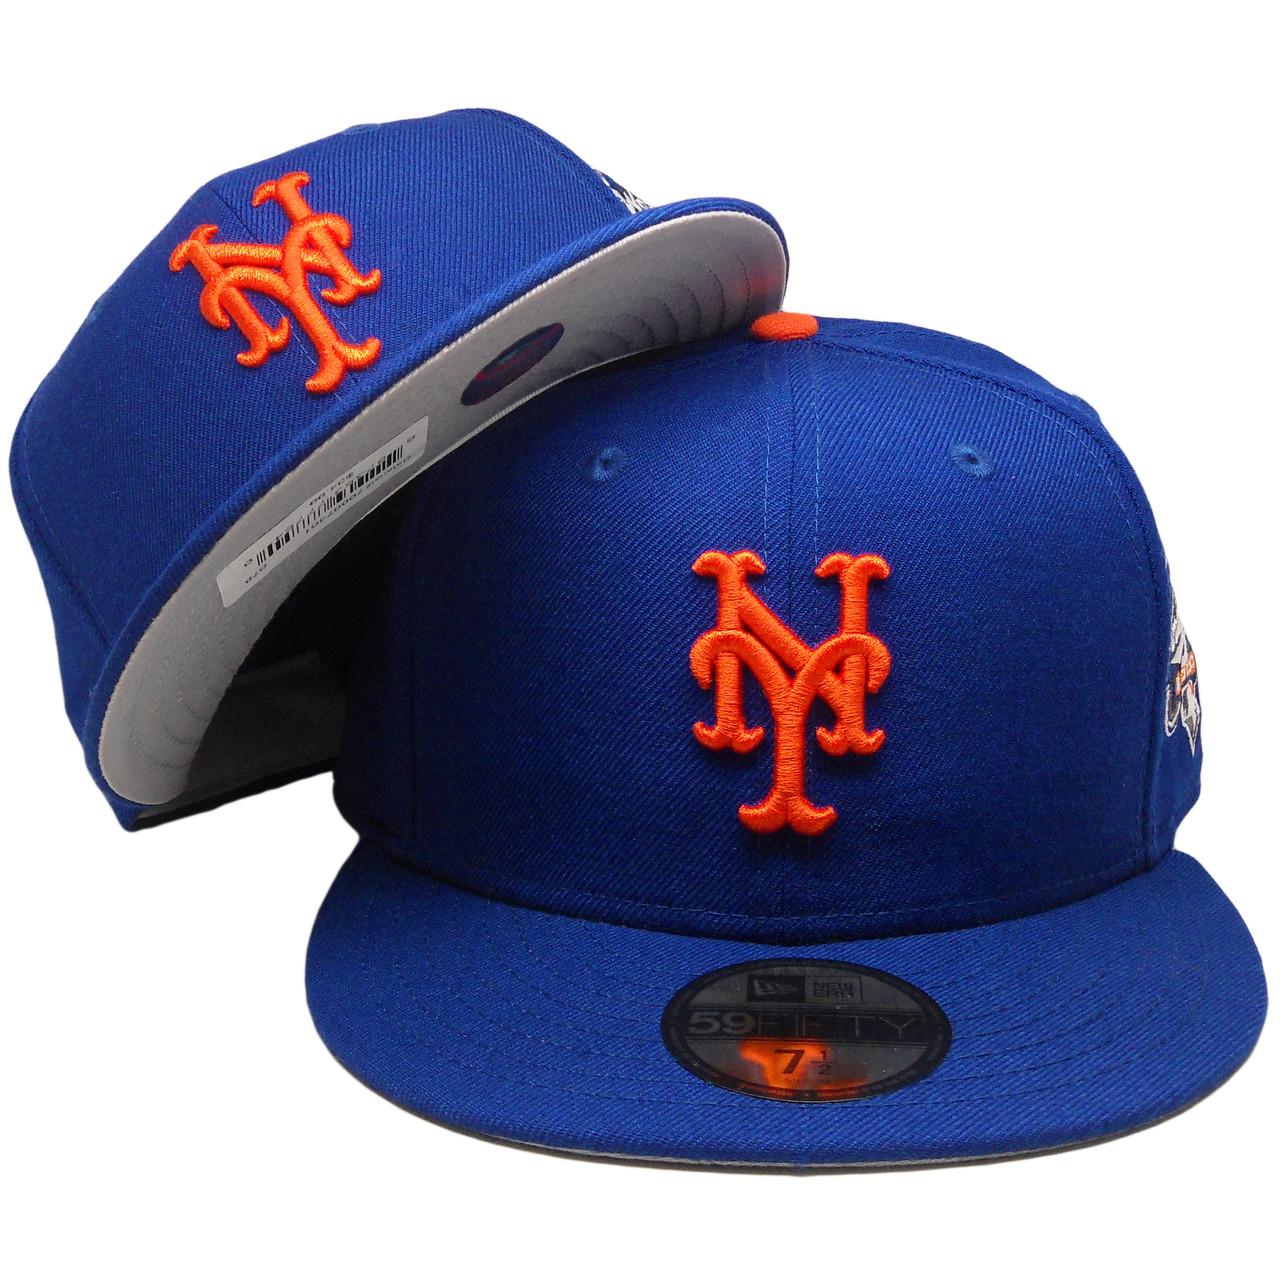 half off 946ac a0e10 ... spain new york mets new era custom 59fifty fitted hat royal orange white  3bf13 57eca